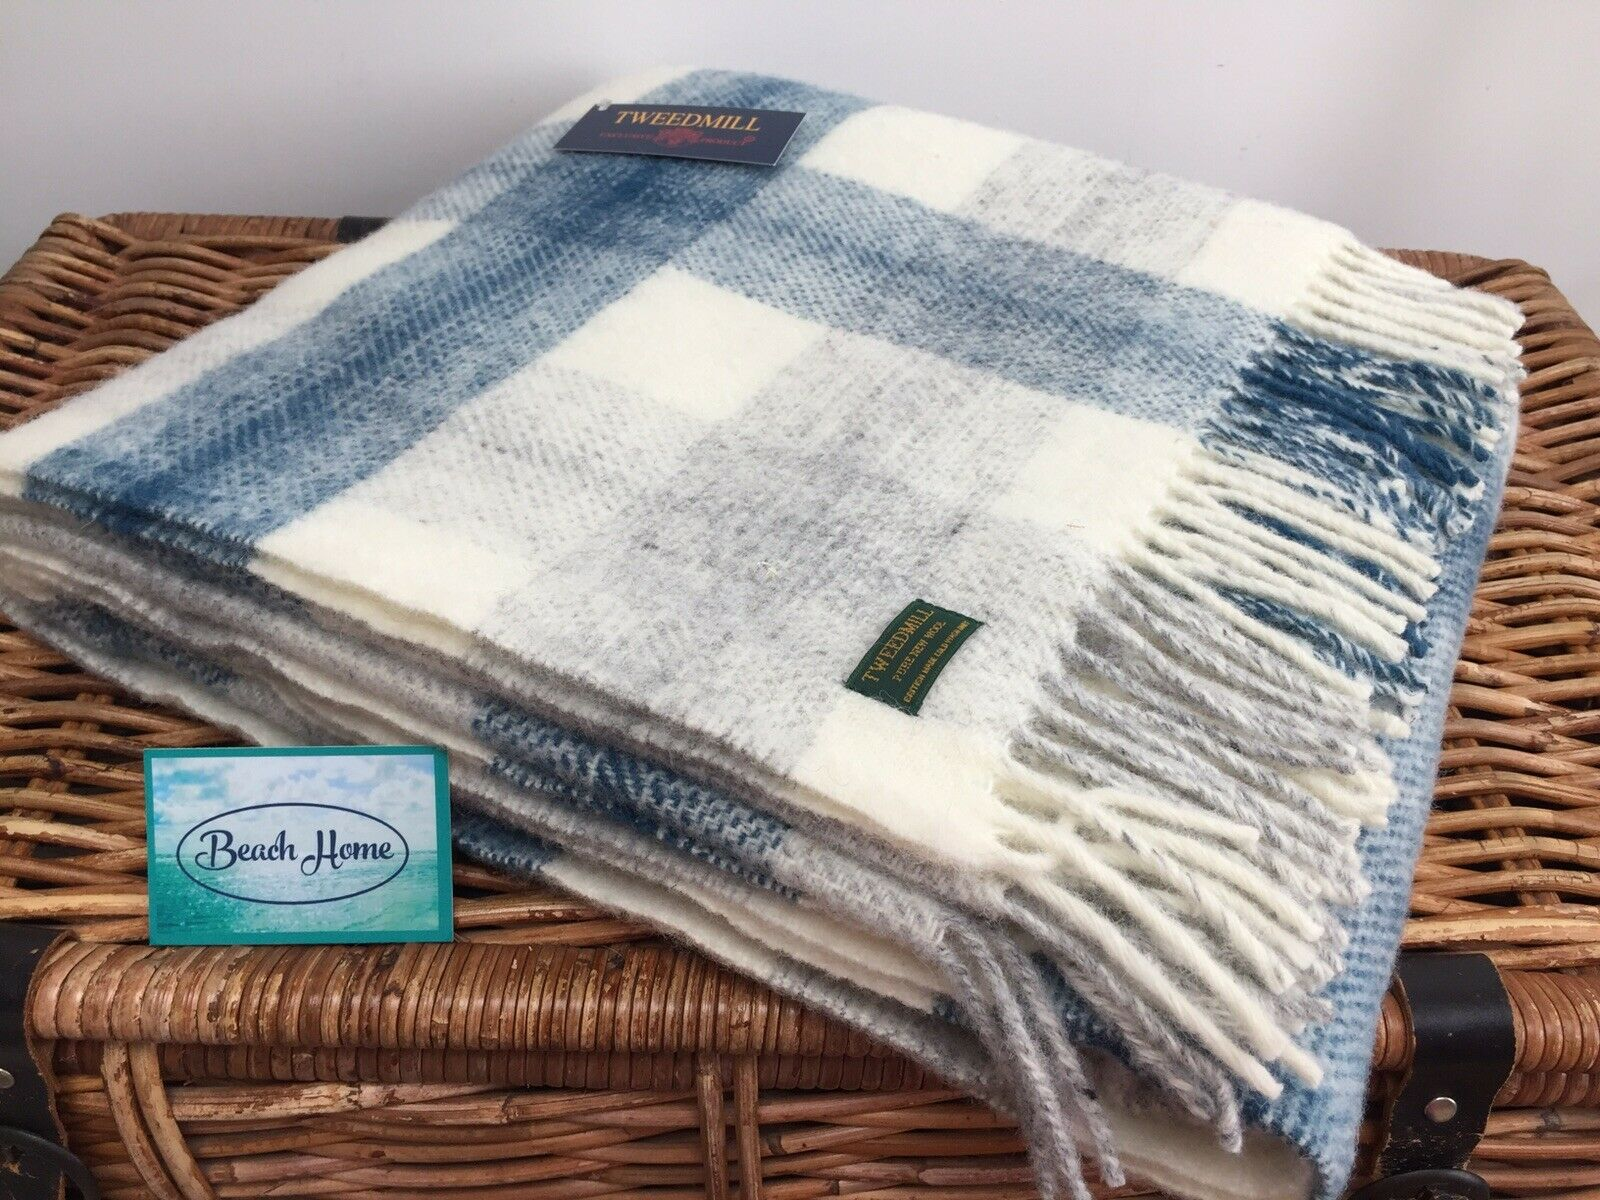 Tweedmill Textiles Prado Tinta Azul gris Crema cheque Manta Cobertor Alfombra De Lana Pura